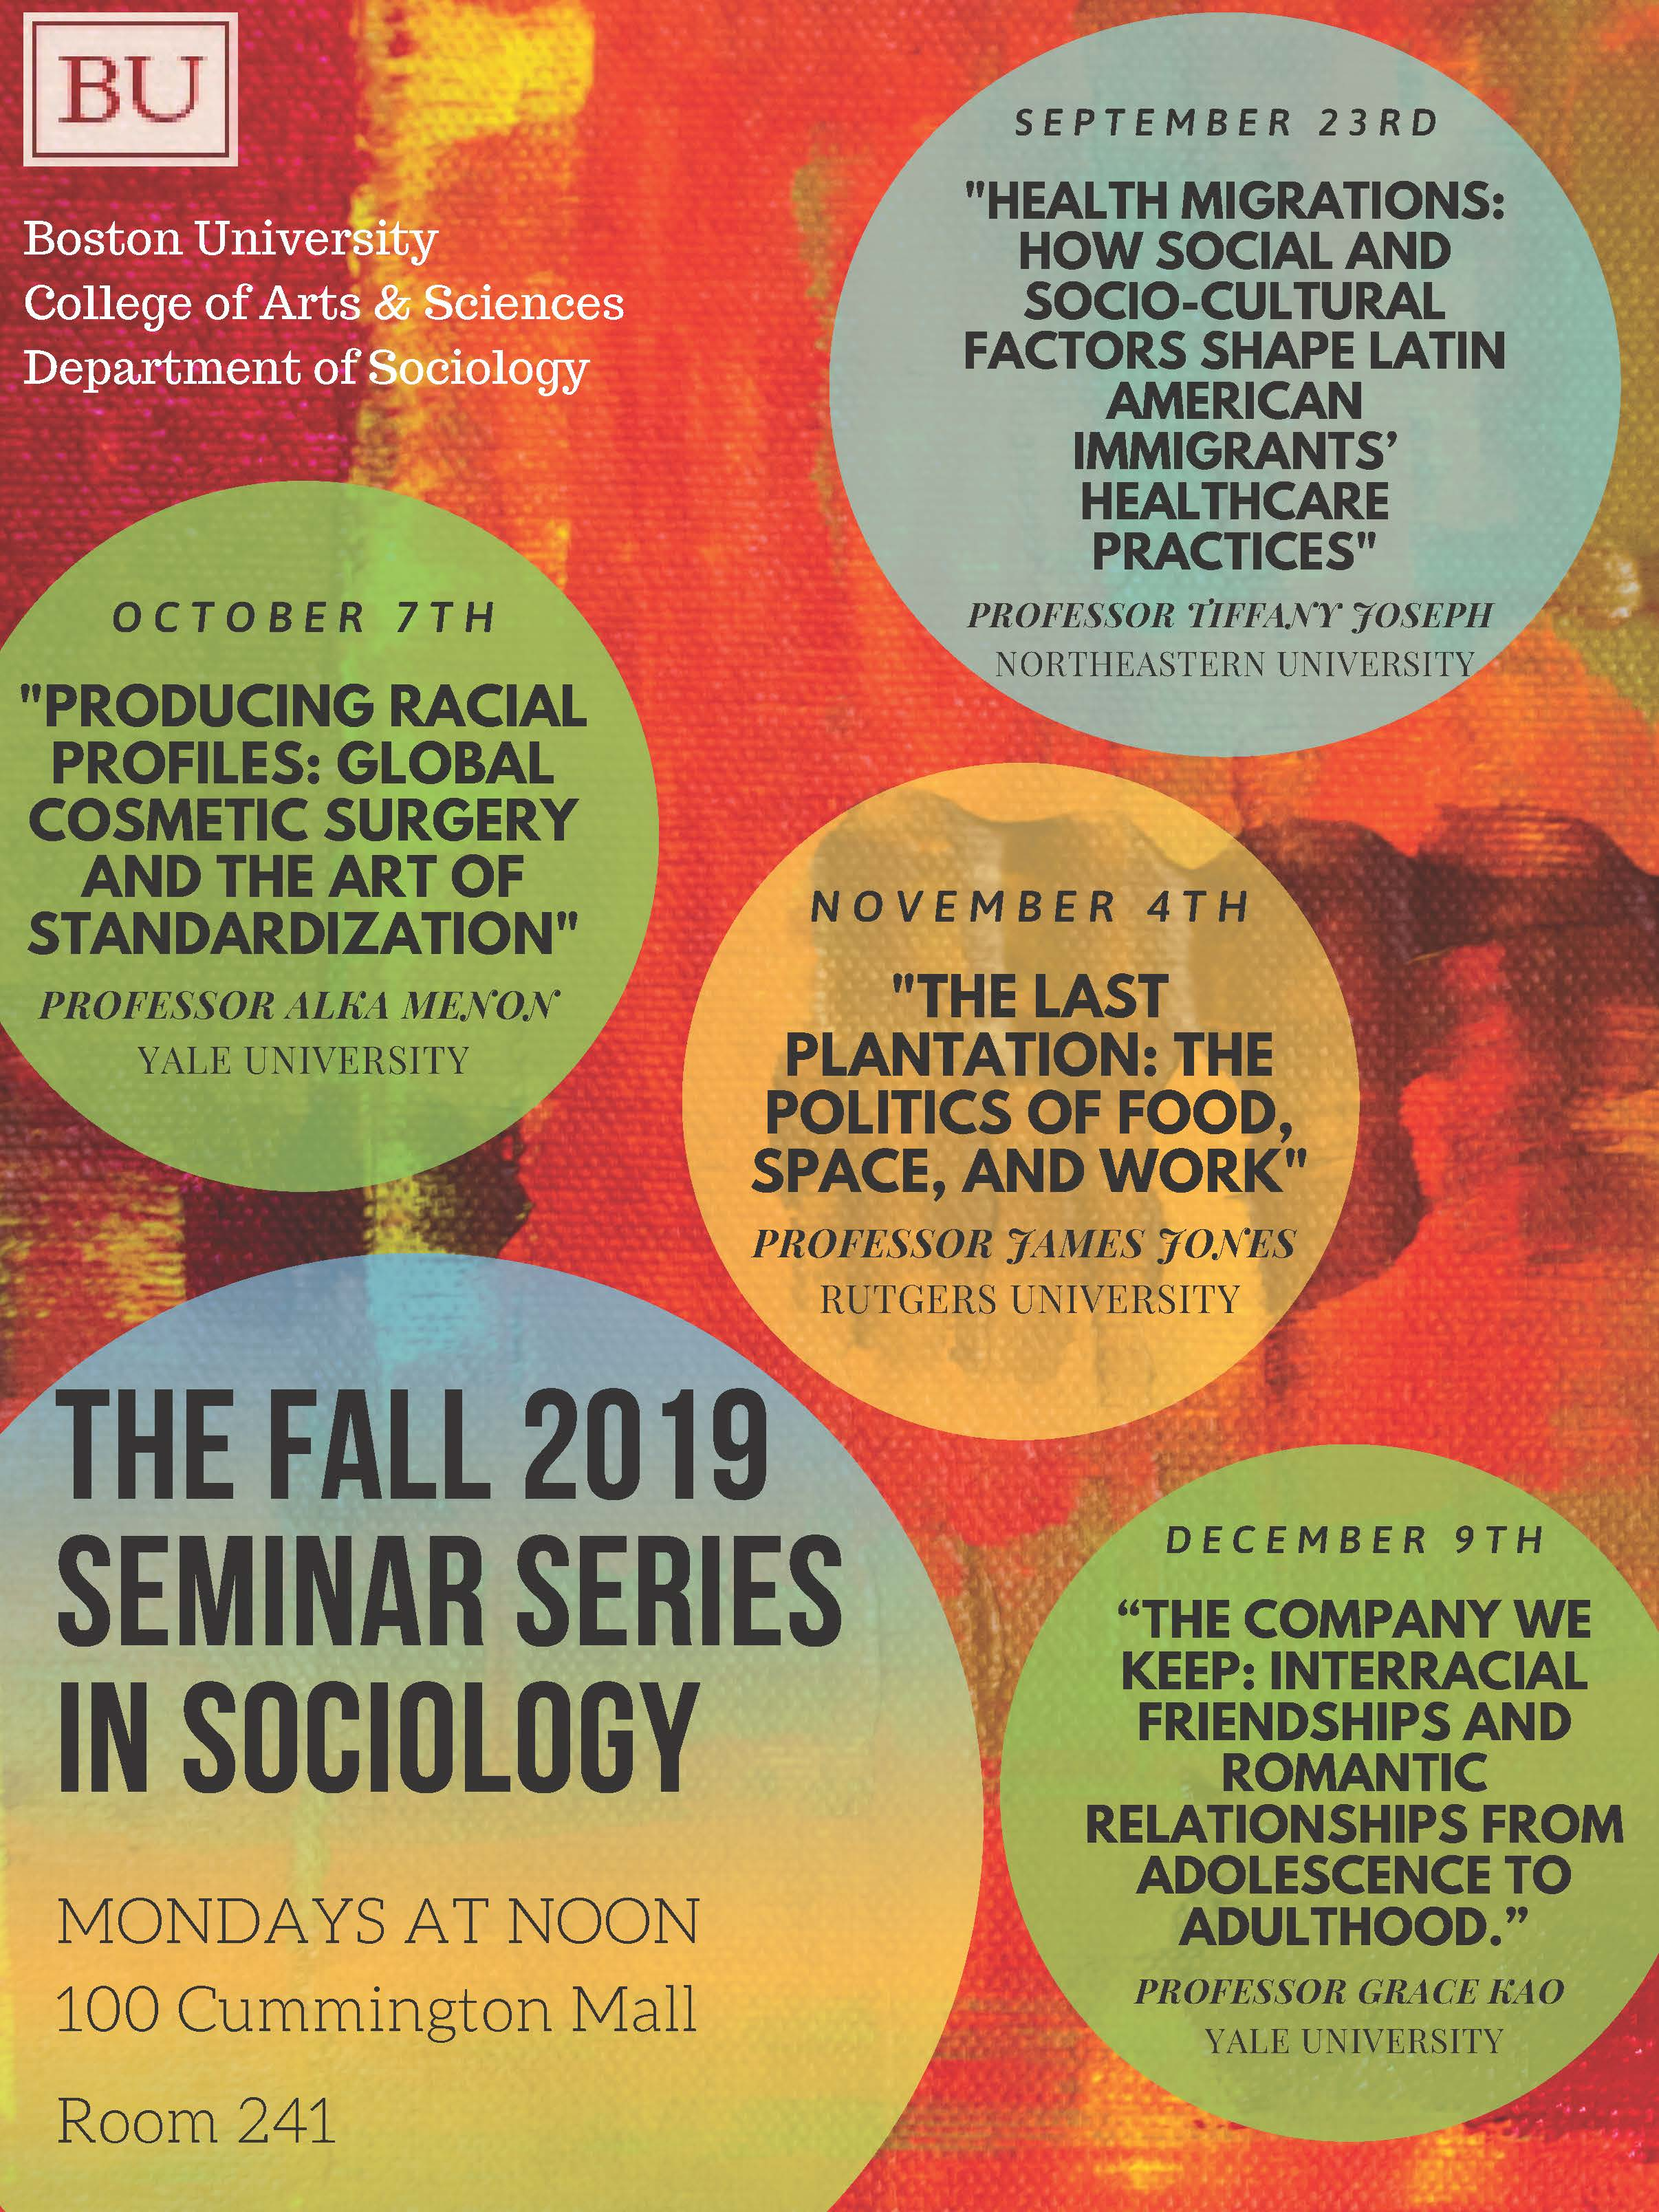 Seminar Series » Sociology | Boston University